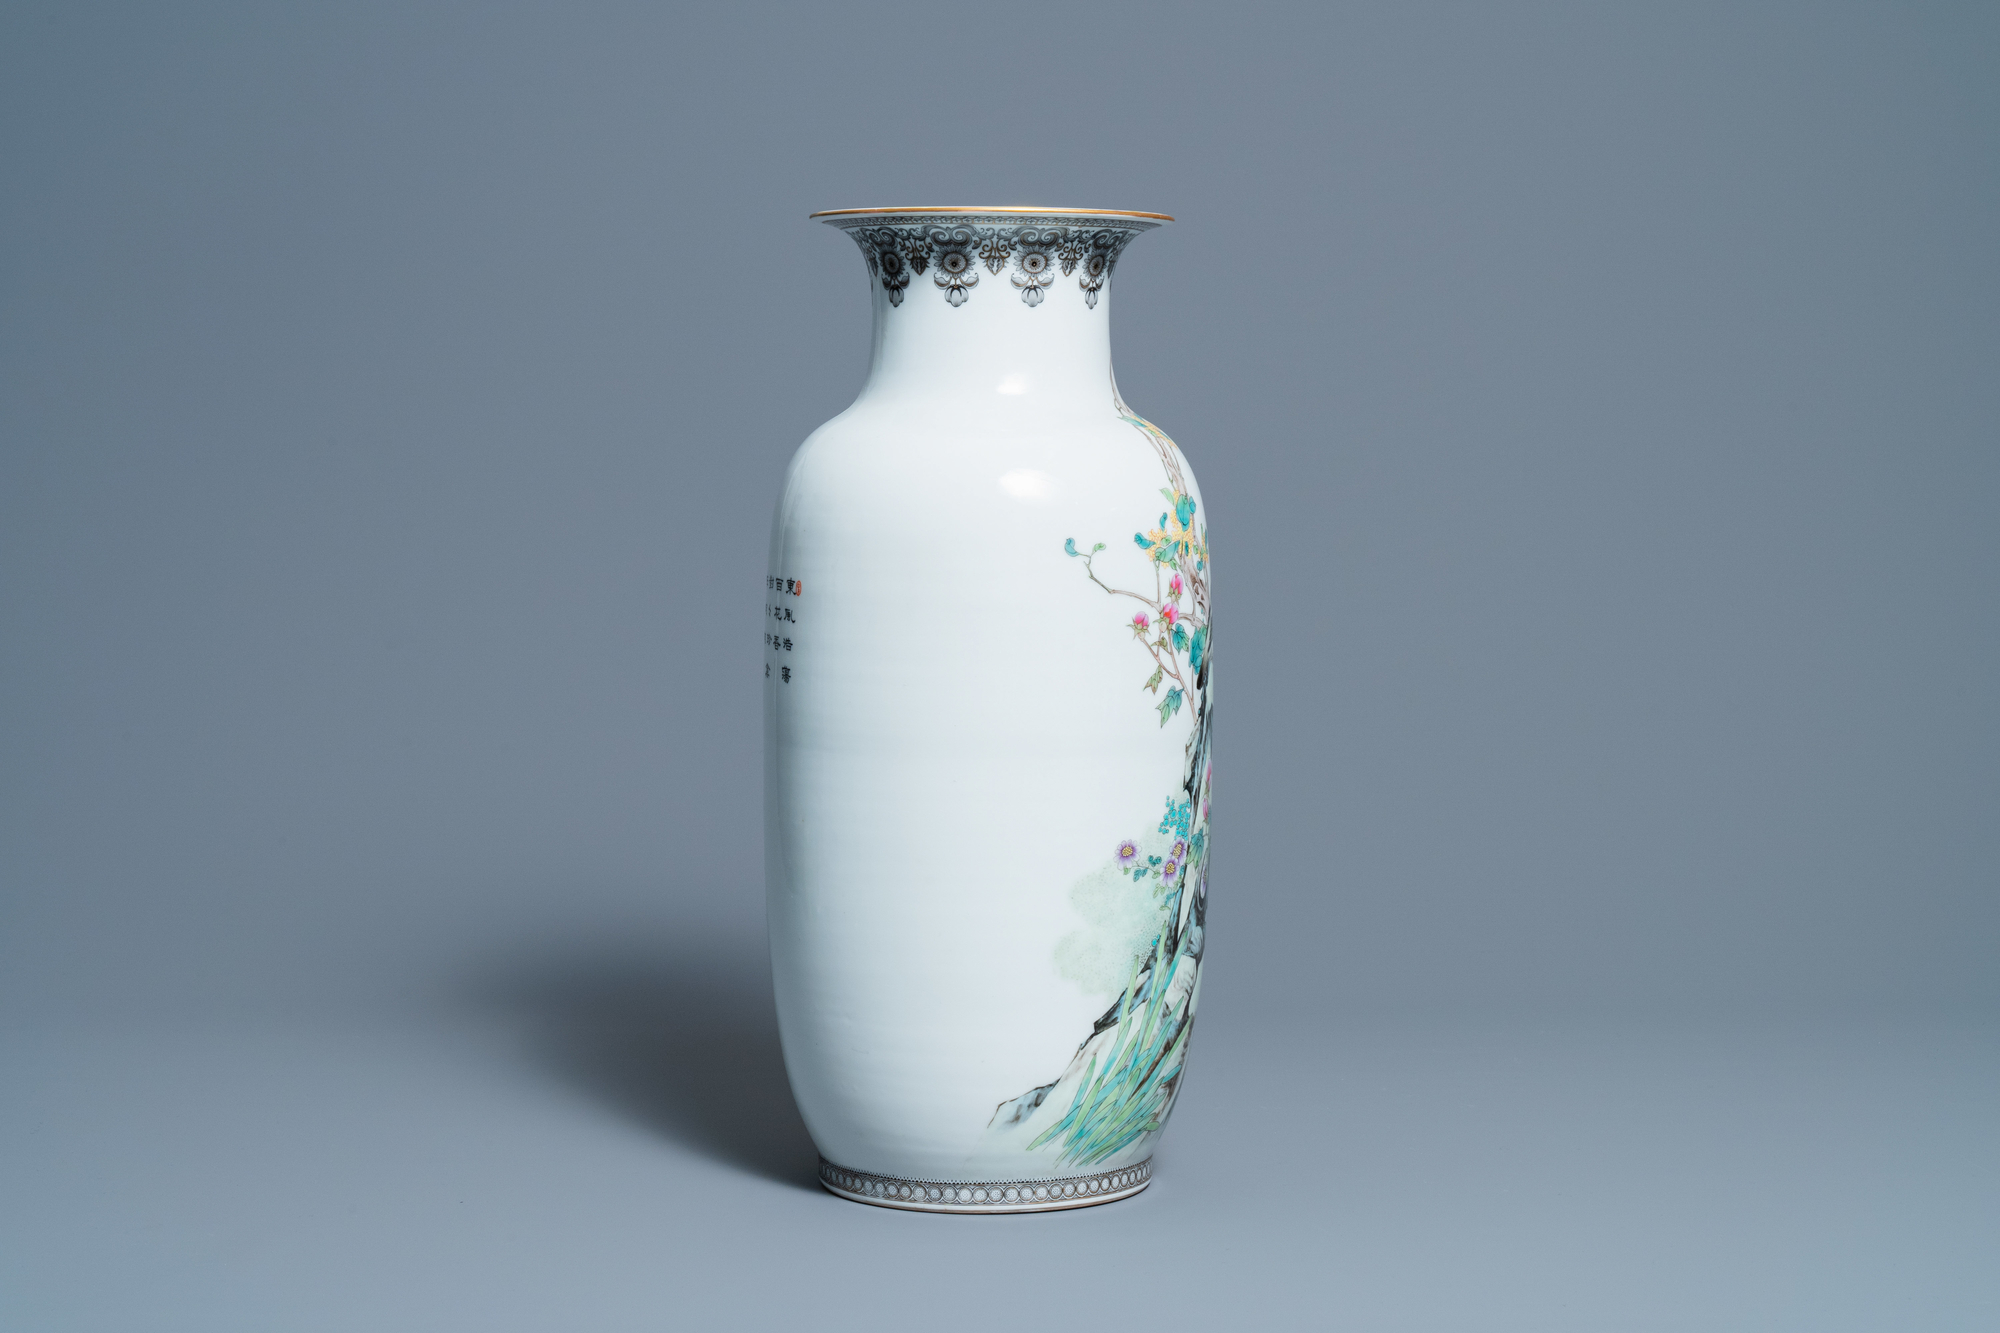 A fine Chinese famille rose vase, Zhong Guo Jingdezhen Zhi mark, Republic - Image 4 of 6